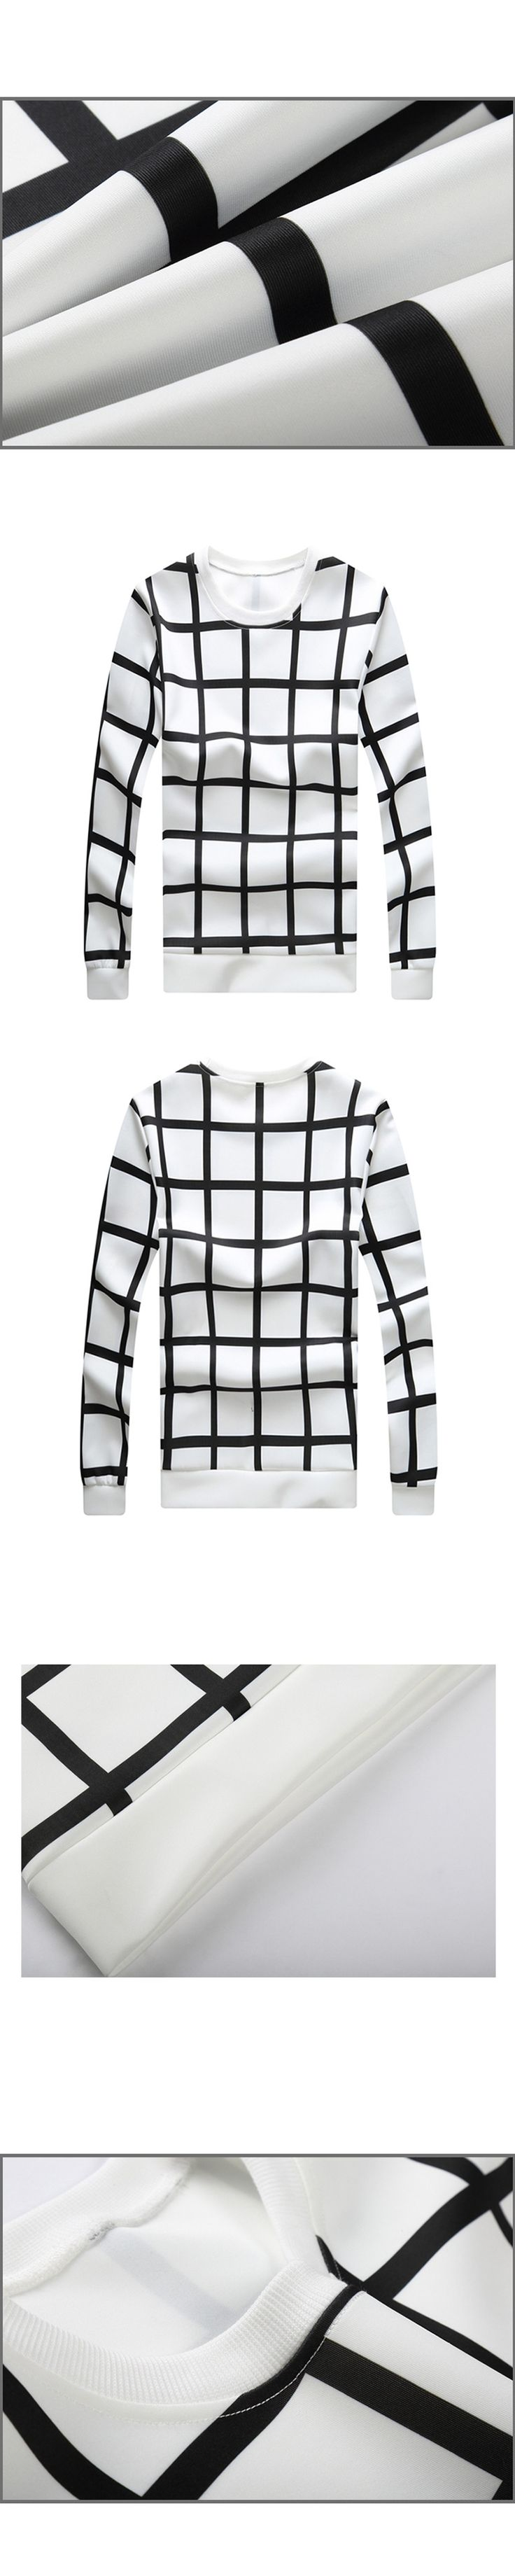 Men's brand high-quality casual sweat men 2017 new fashion sudadera hombre de marca Black and white grid round neck